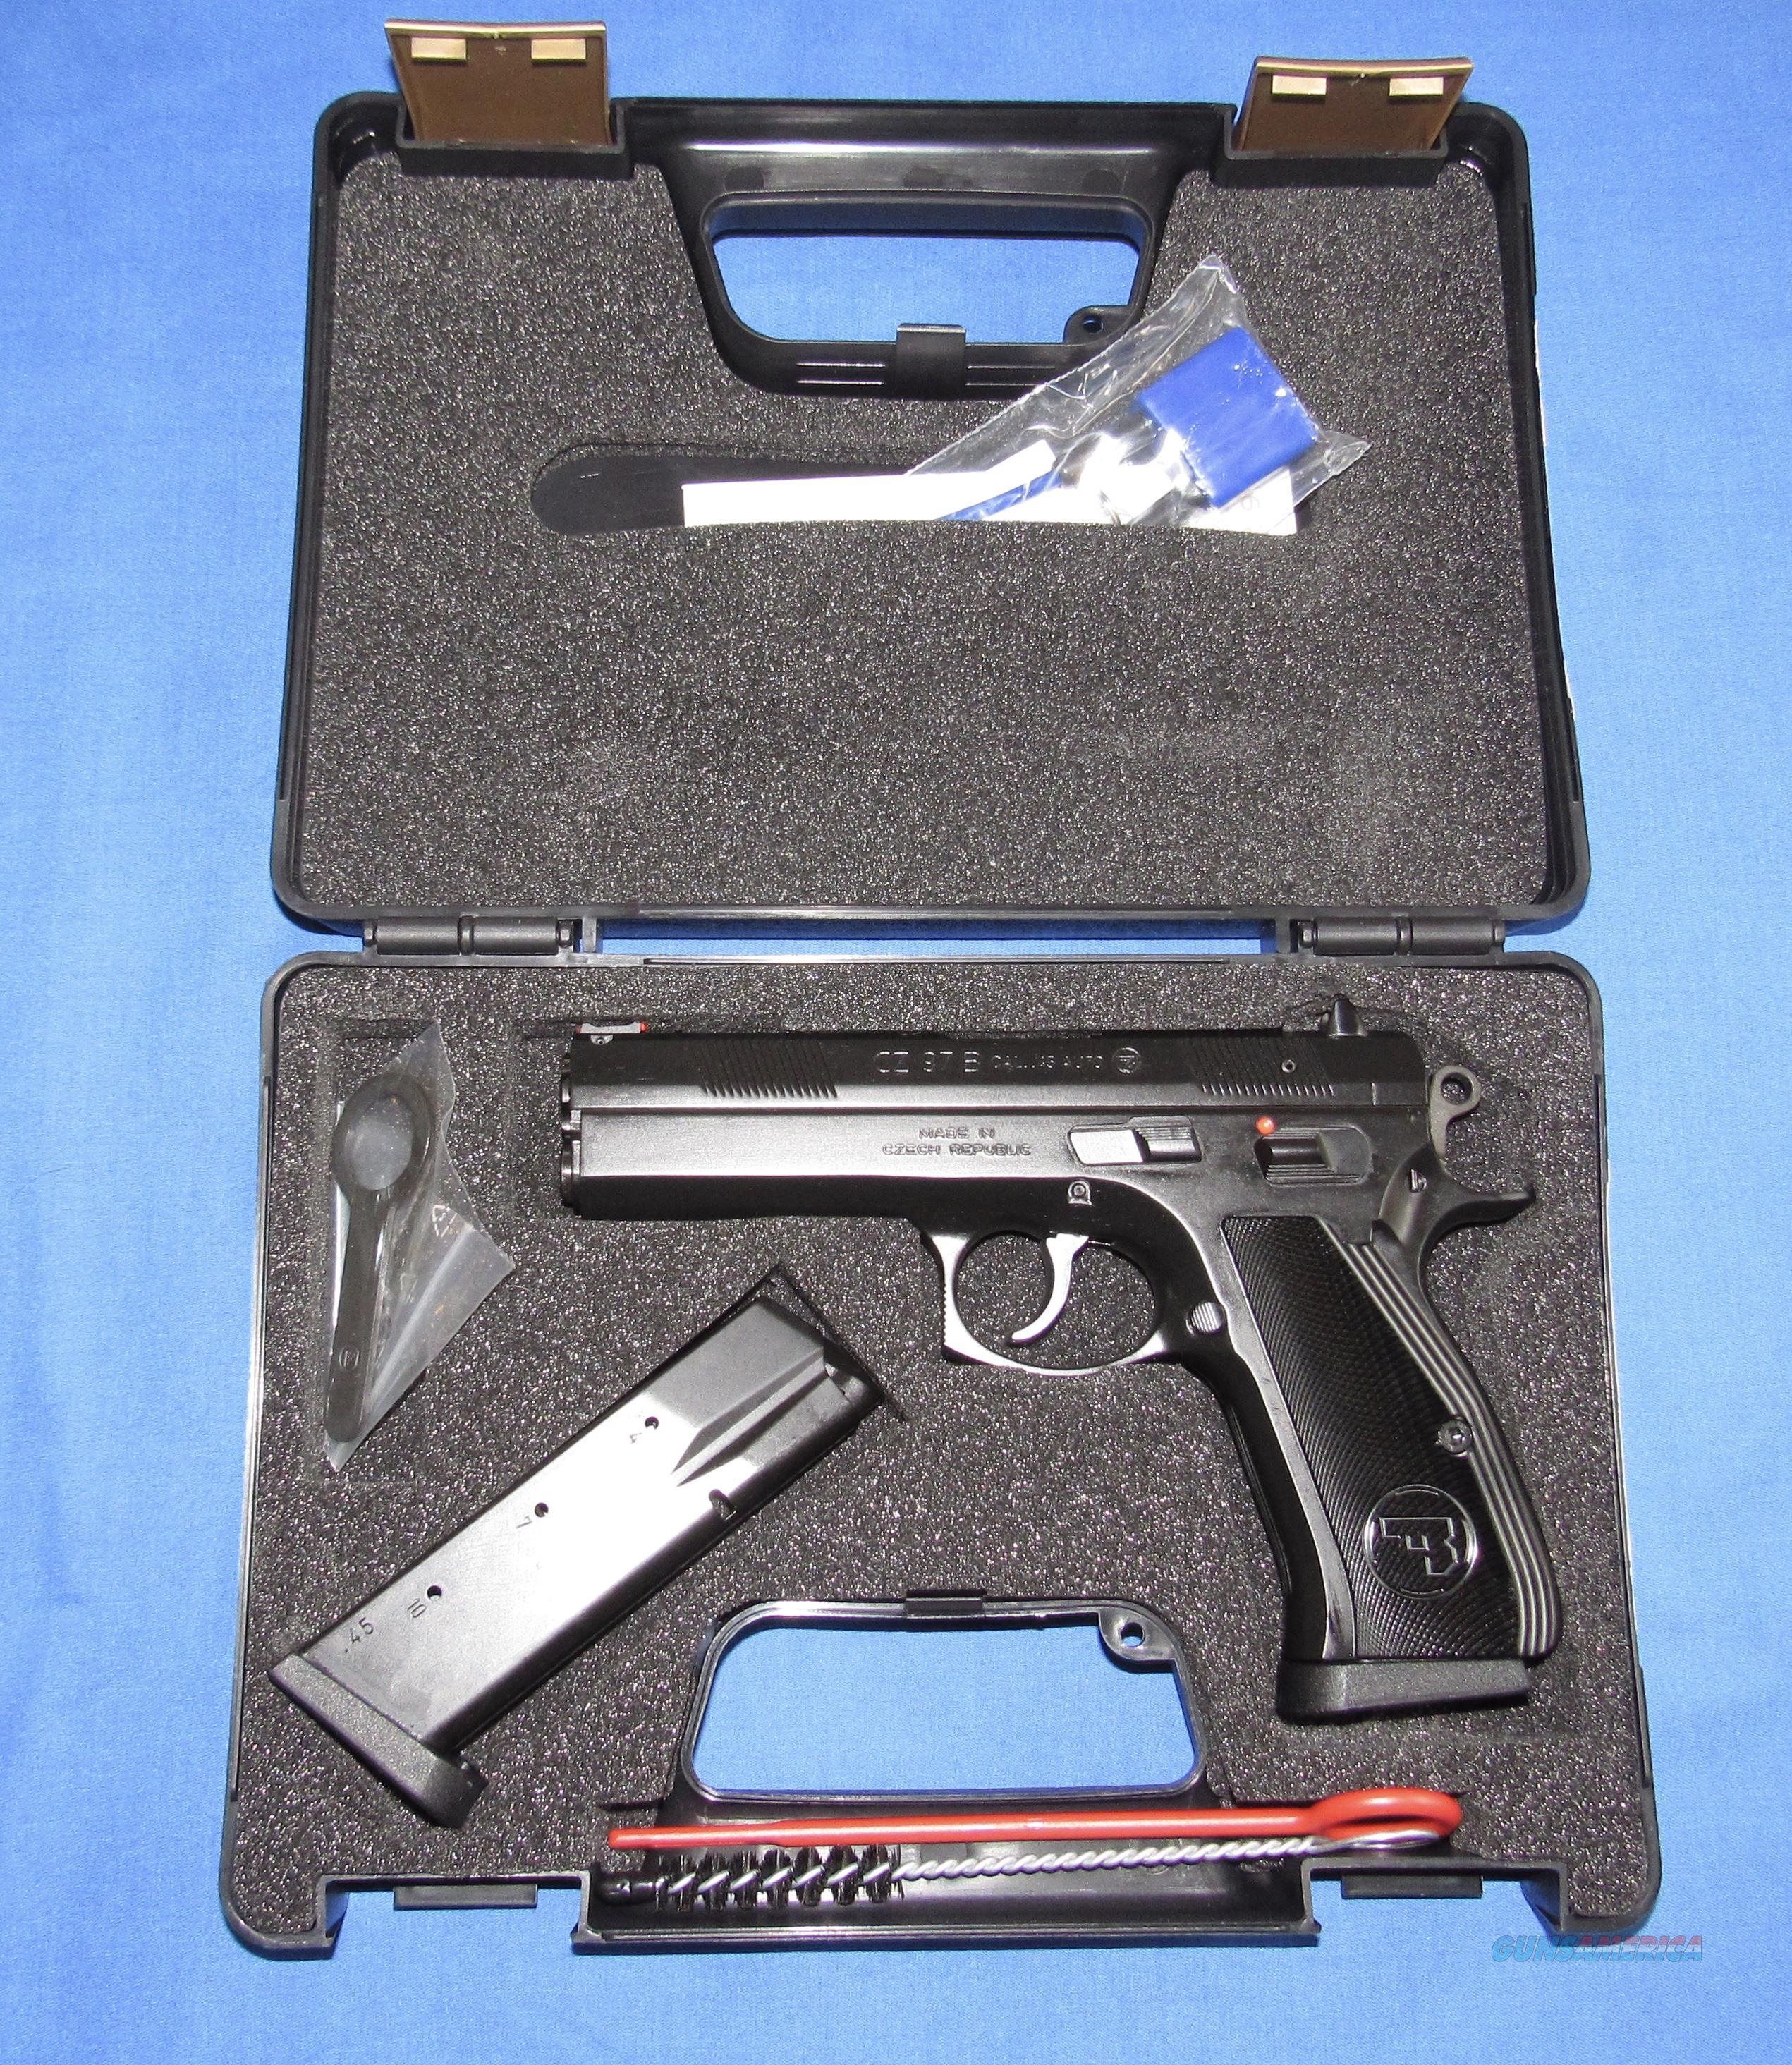 CZ 97 B 45 ACP SEMI-AUTO PISTOL  Guns > Pistols > CZ Pistols